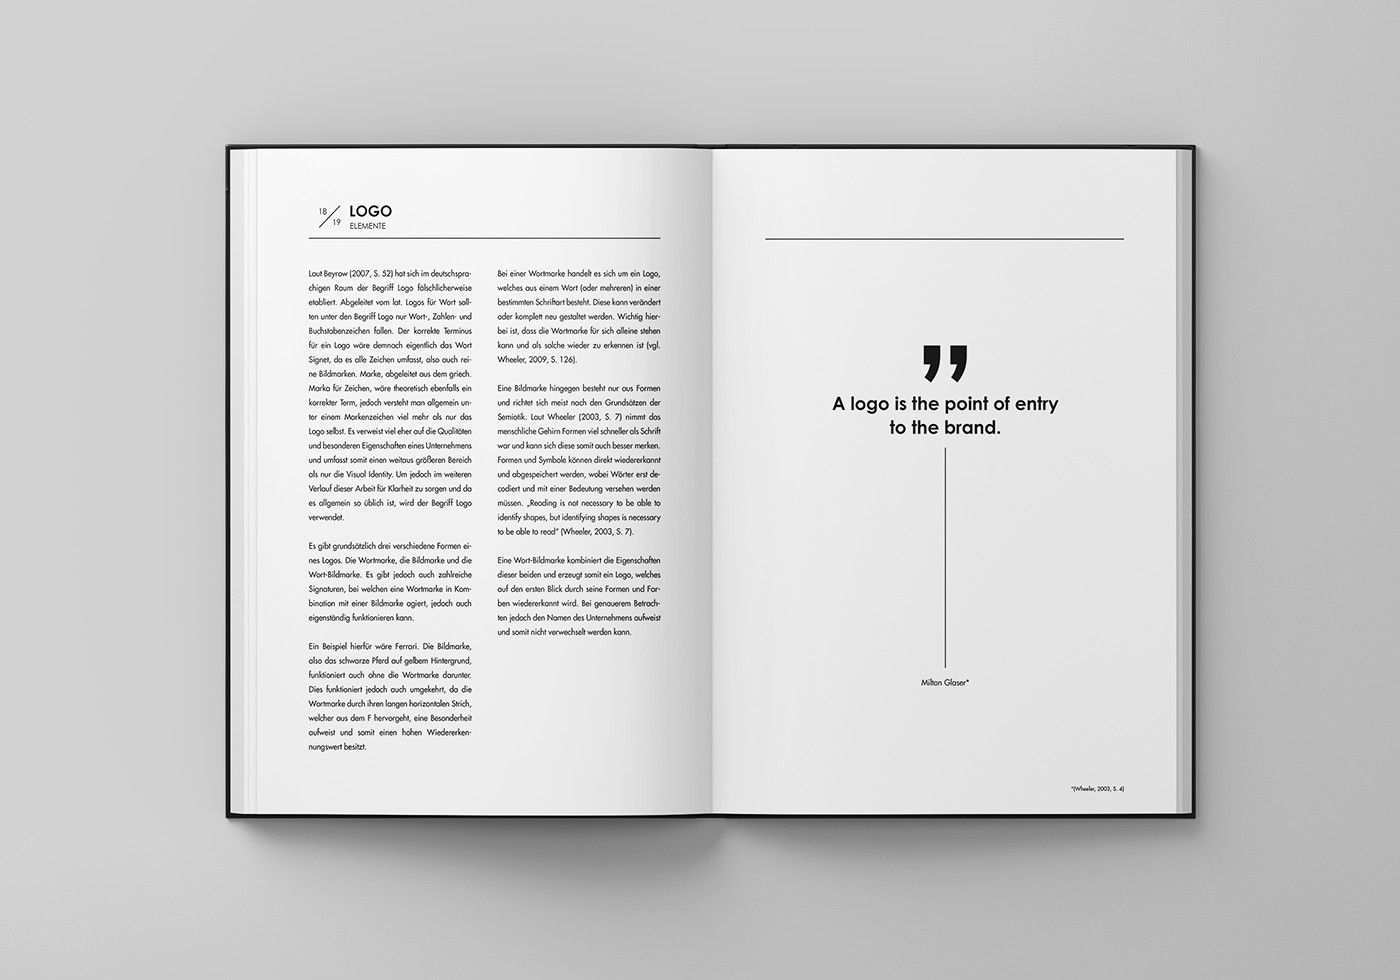 Nasa Visual Identity Toolkit On Behance Visual Identity Nasa Identity